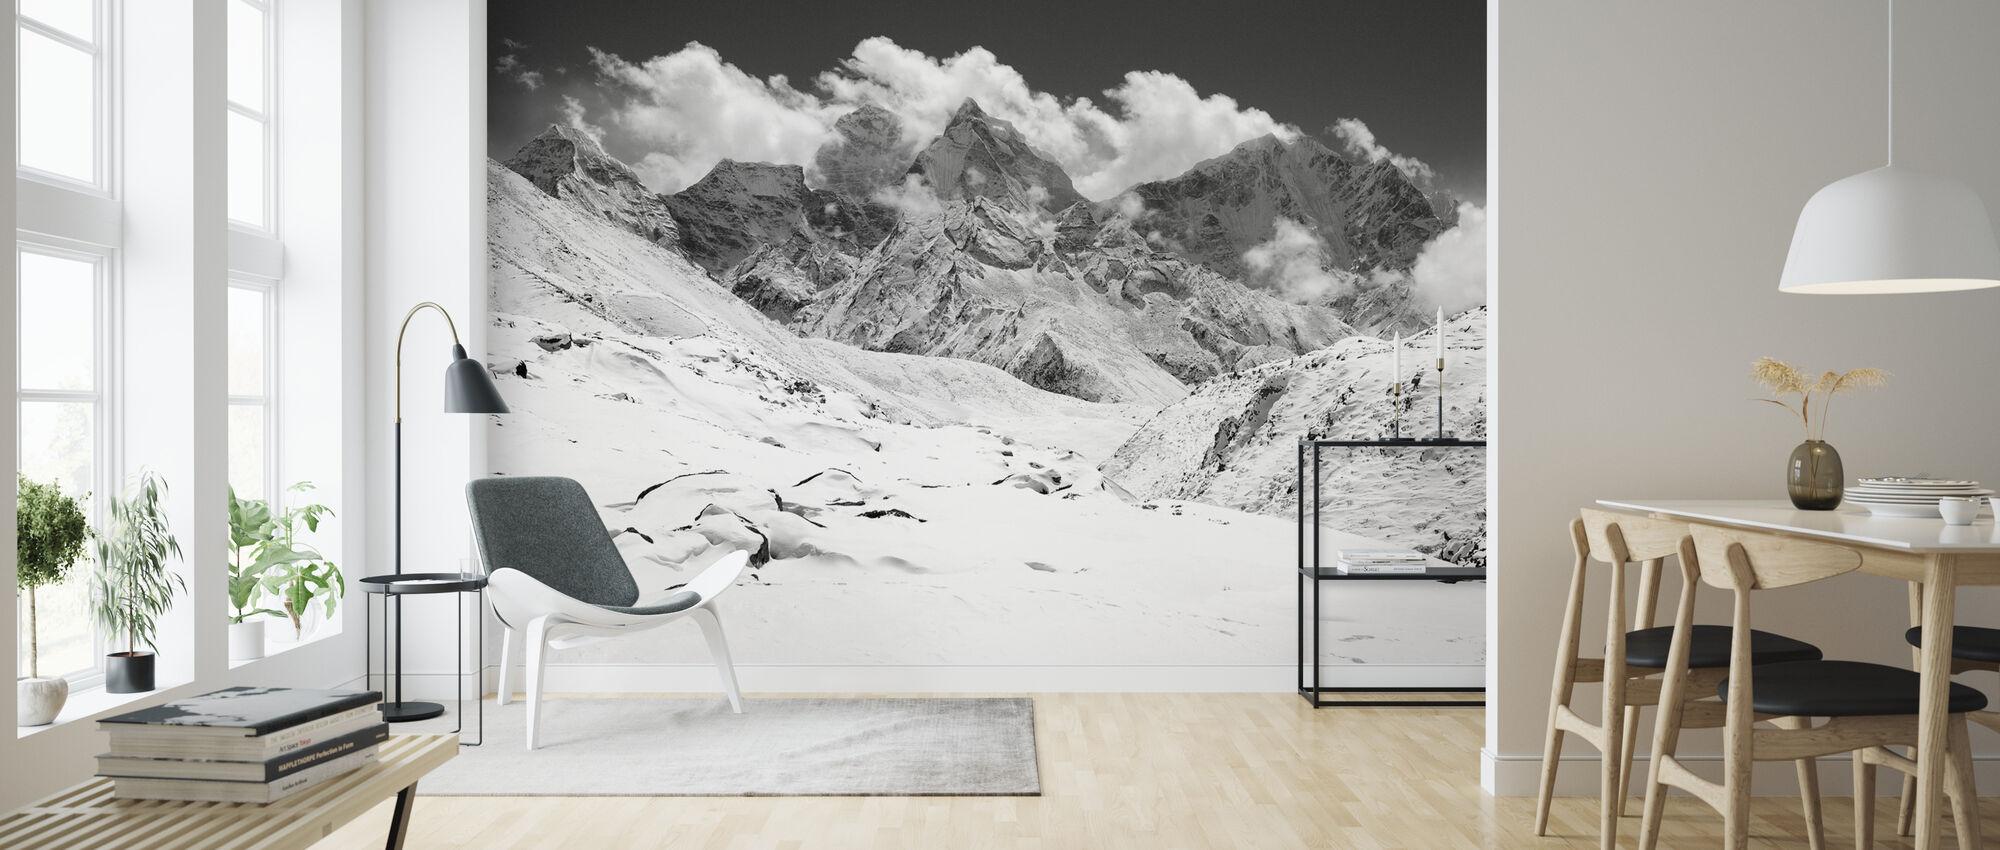 Himalaya - b/w - Wallpaper - Living Room